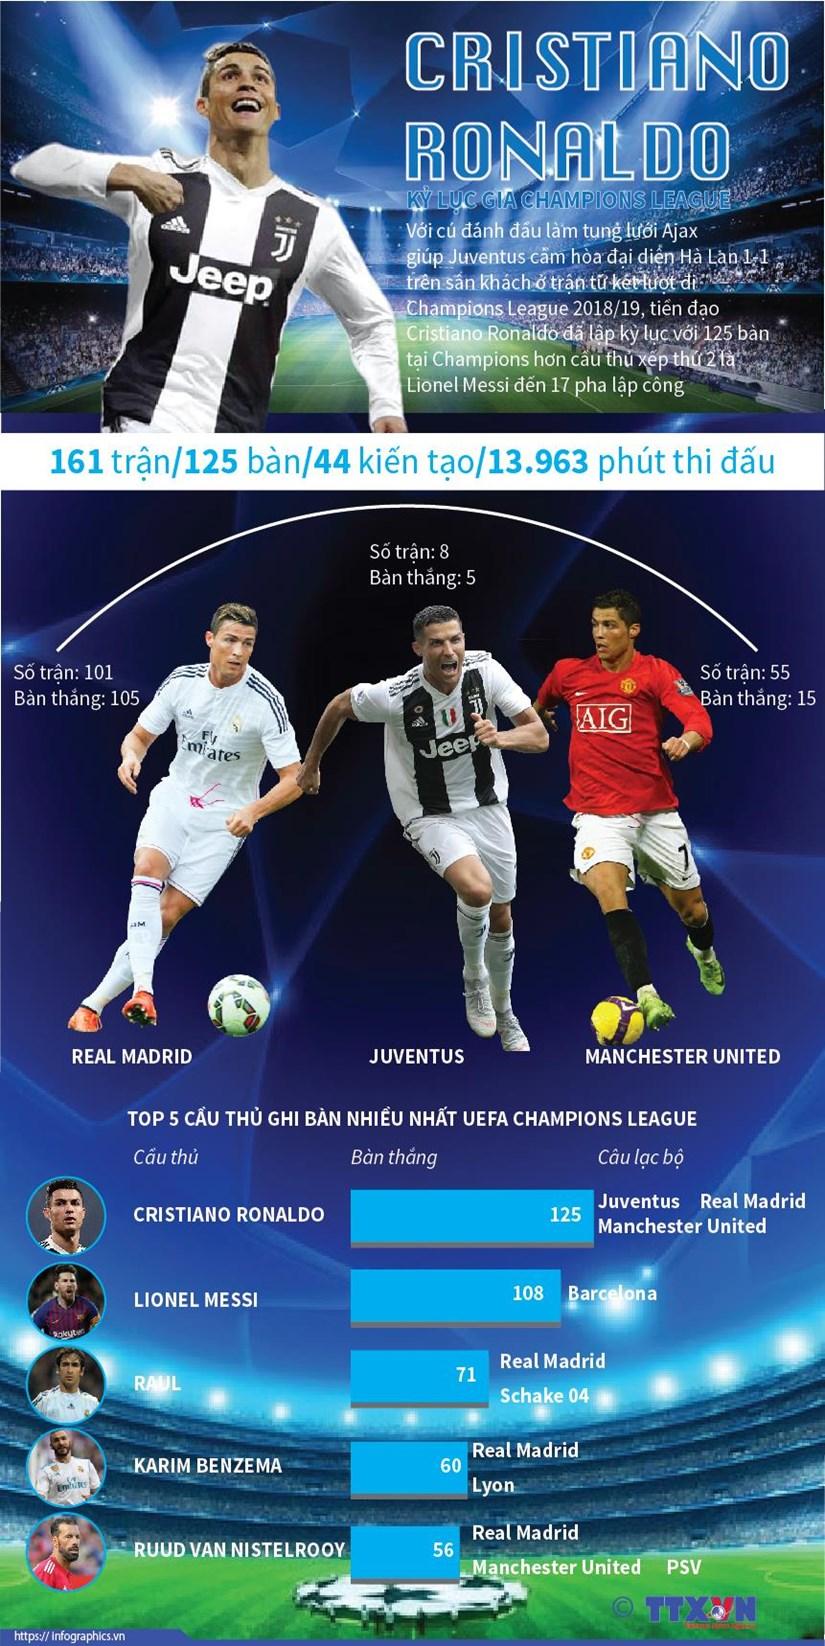 [Infographics] Cristiano Ronaldo - ky luc gia Champions League hinh anh 1